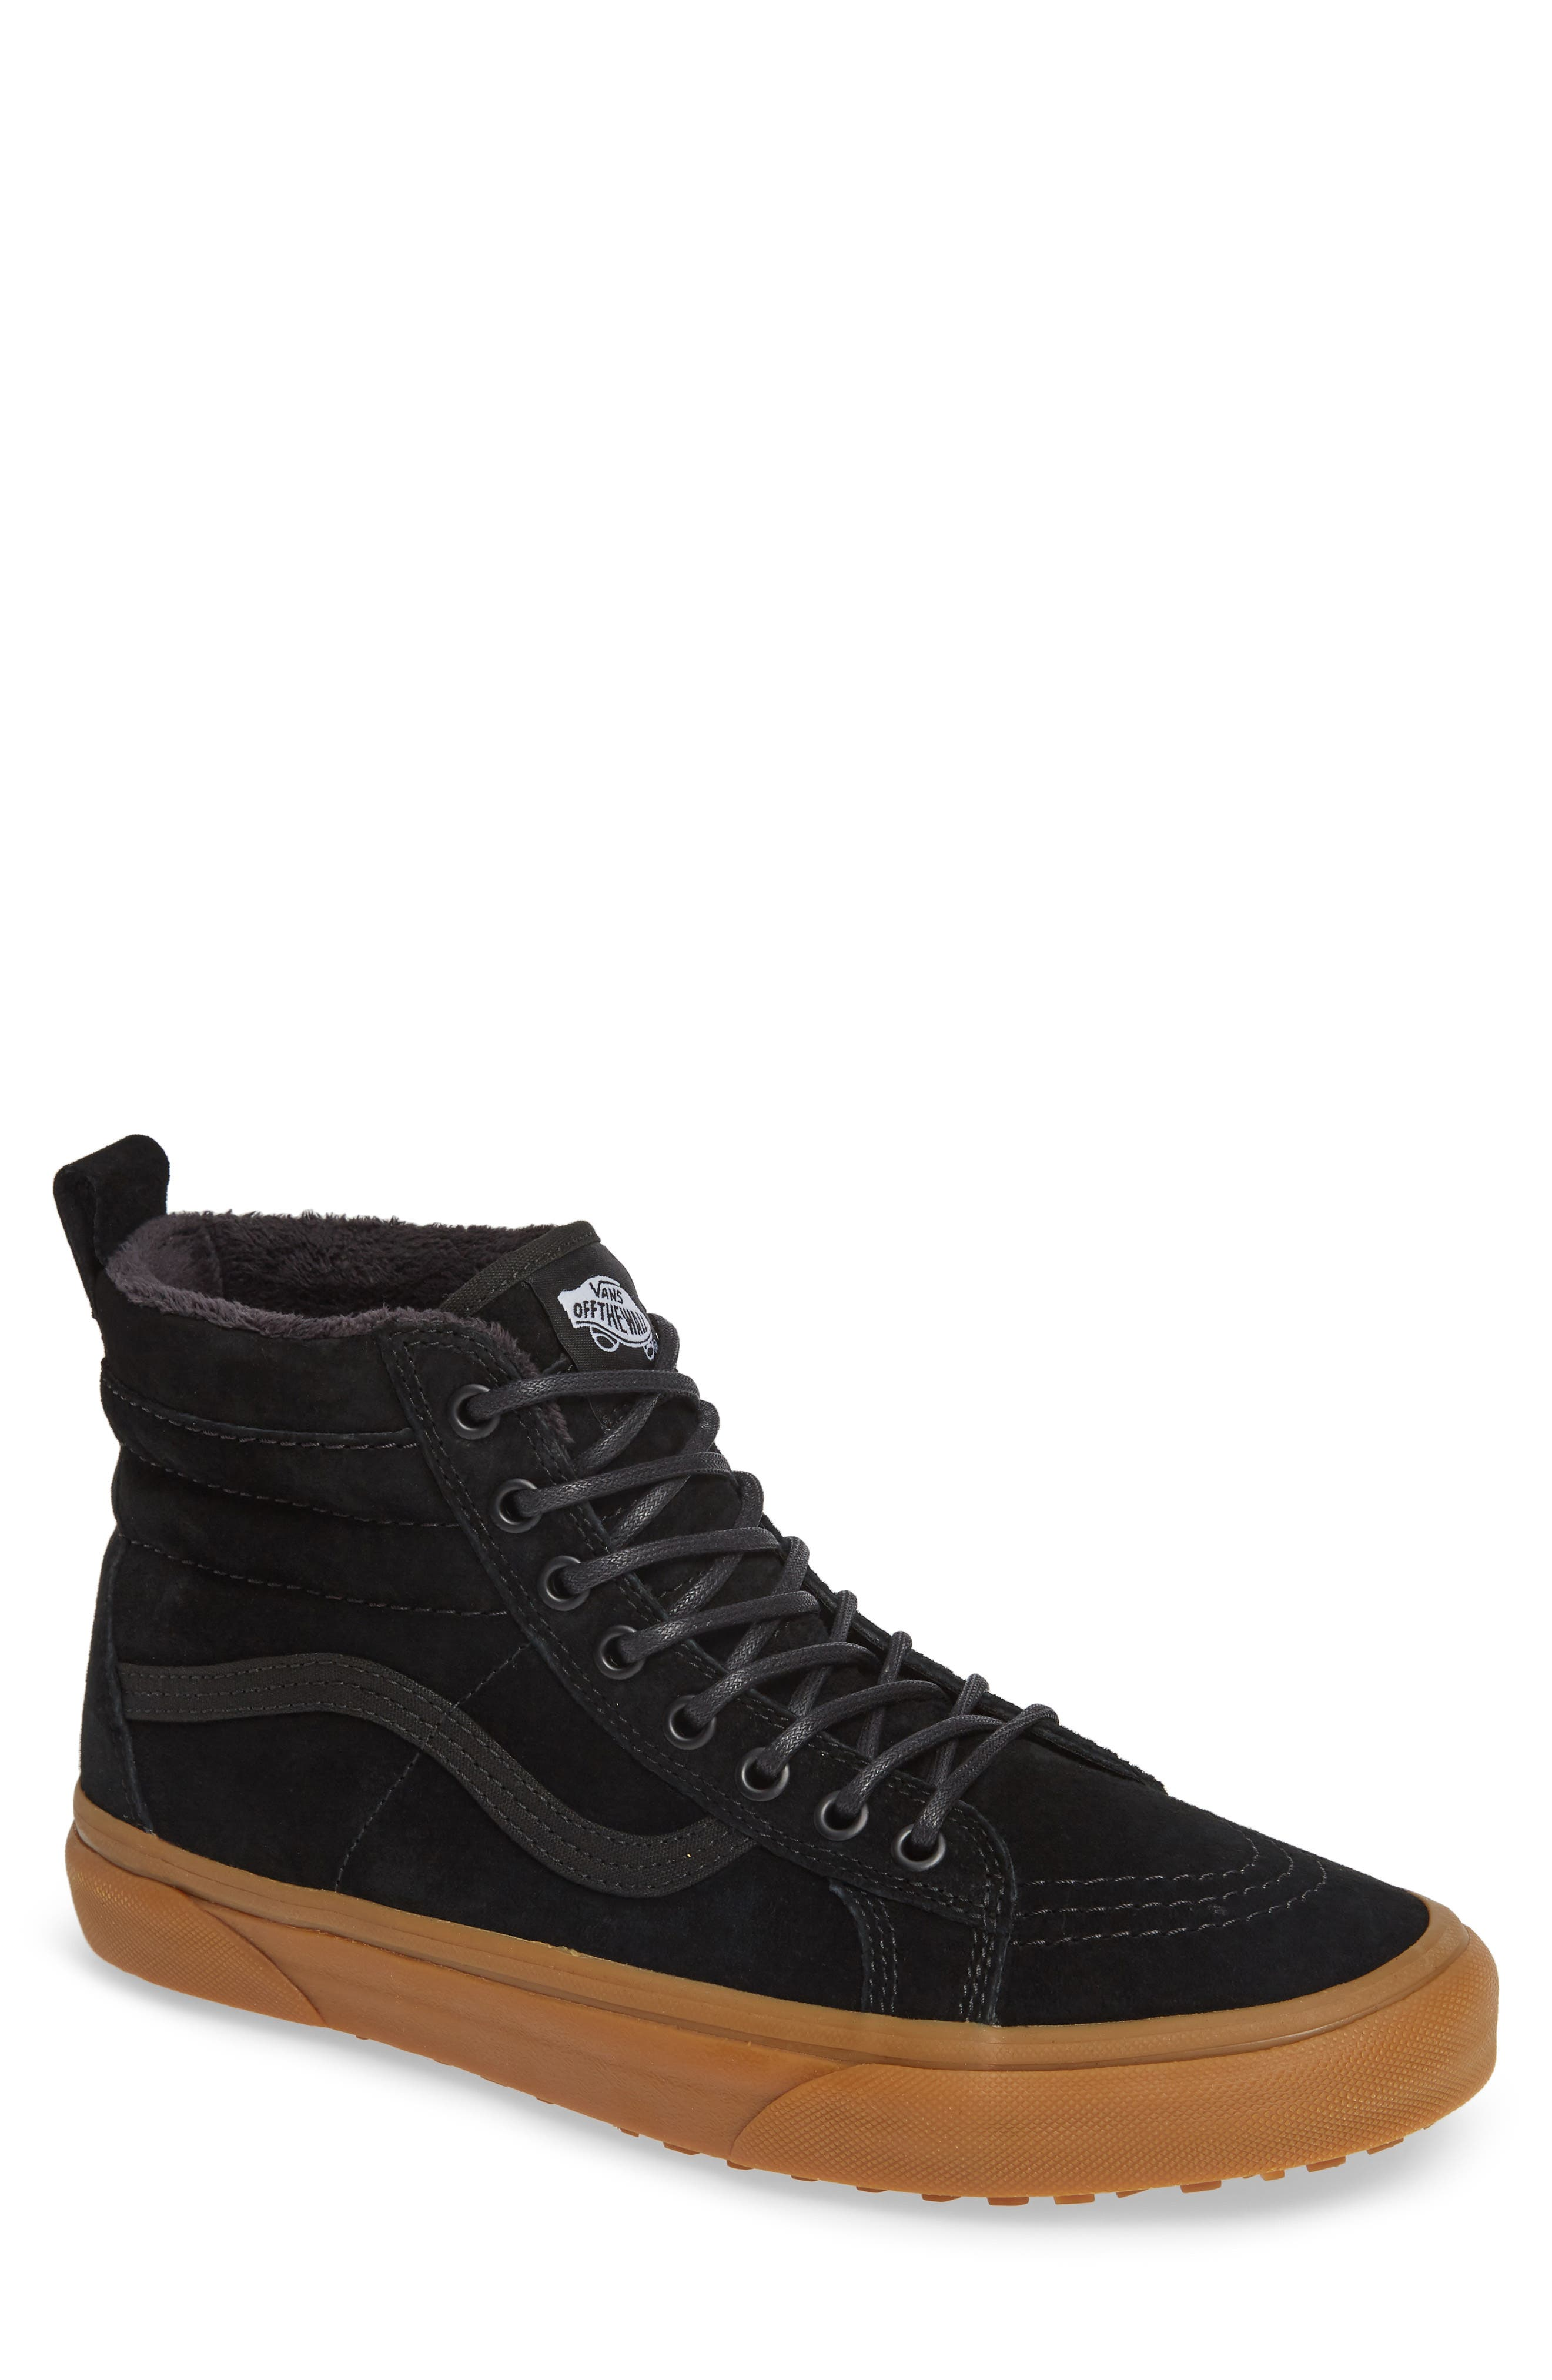 'Sk8-Hi MTE' Sneaker,                         Main,                         color, BLACK/ GUM